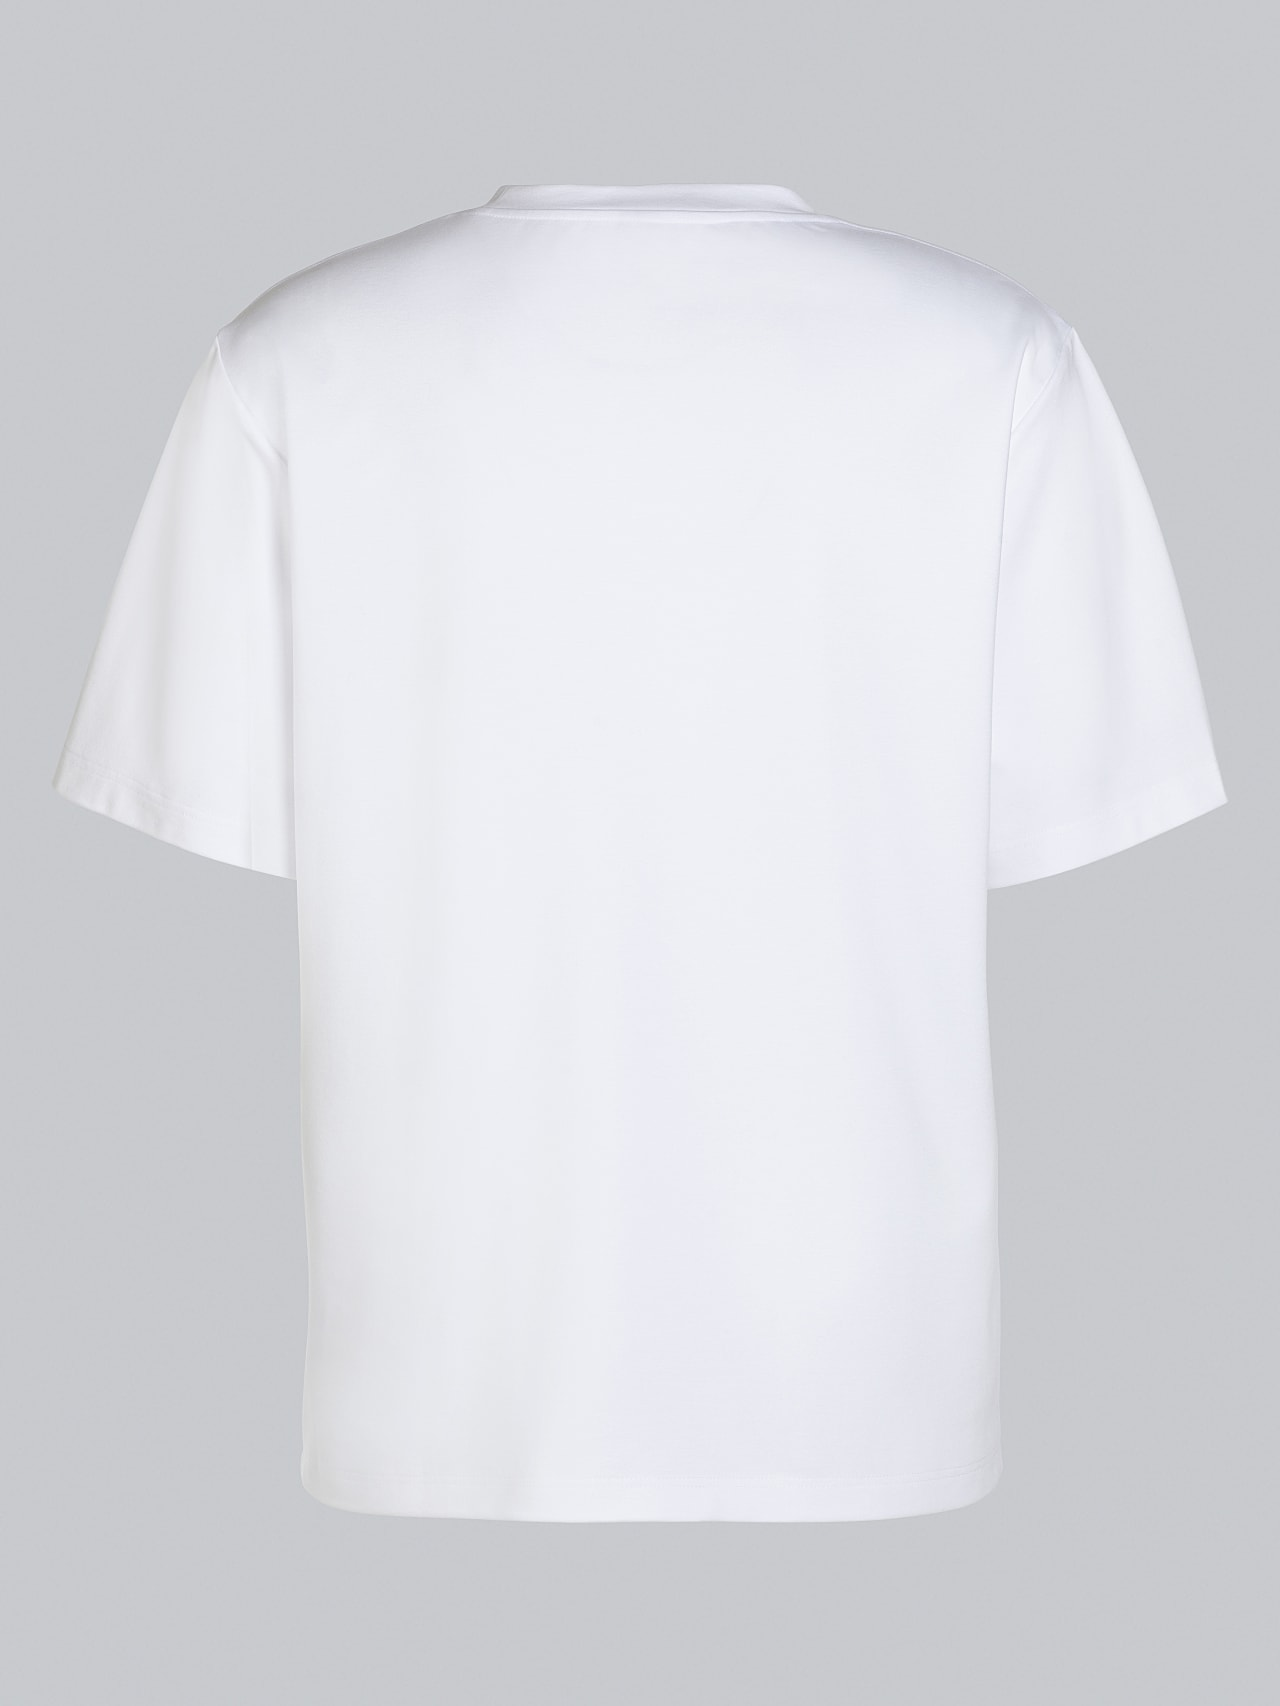 JAHEV V1.Y5.02 Relaxed Logo T-Shirt white Left Alpha Tauri